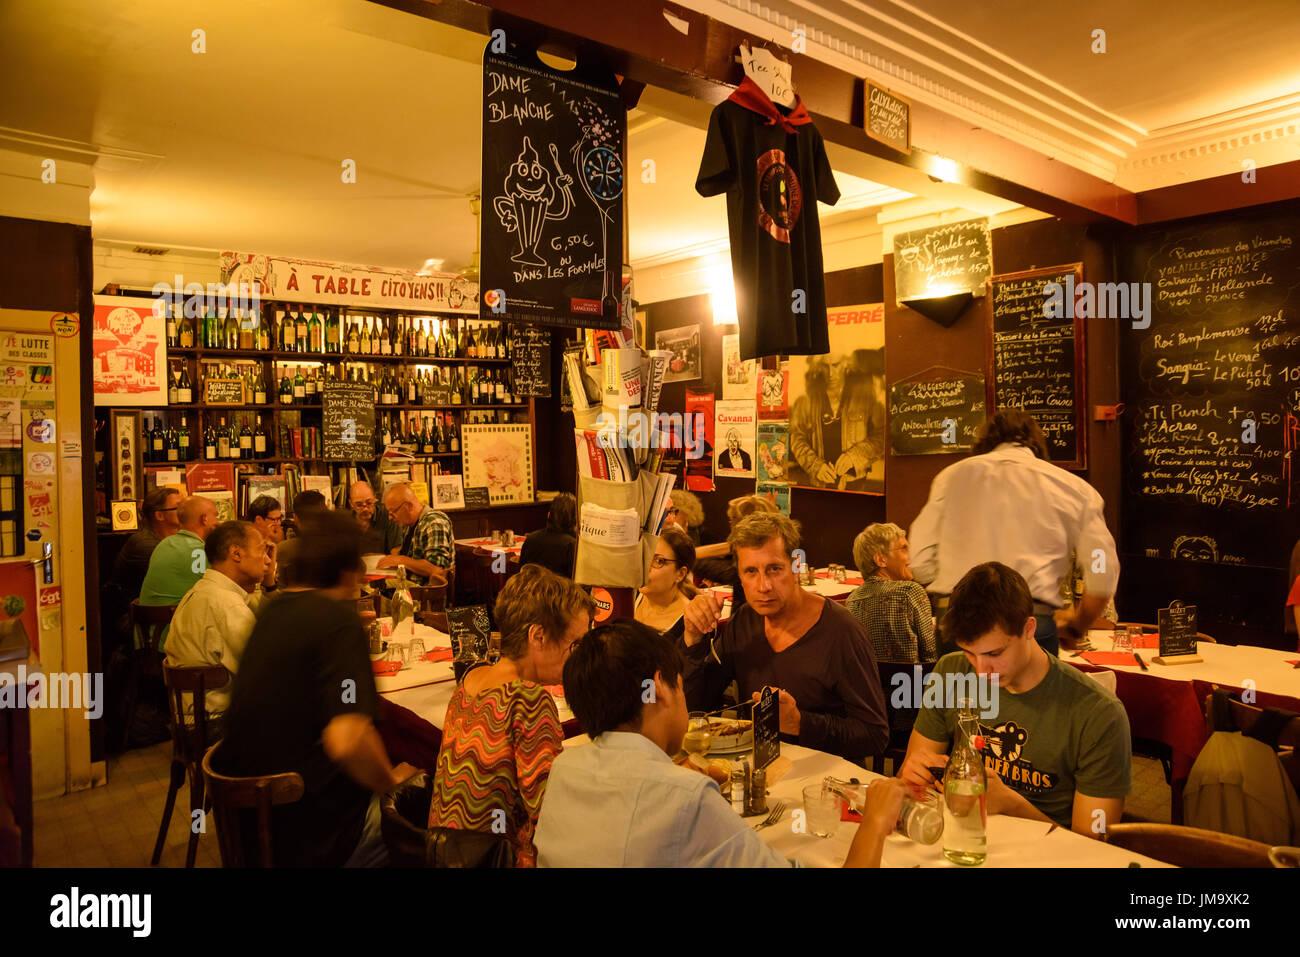 20j hrig stock photos 20j hrig stock images alamy - Restaurant butte aux cailles ...